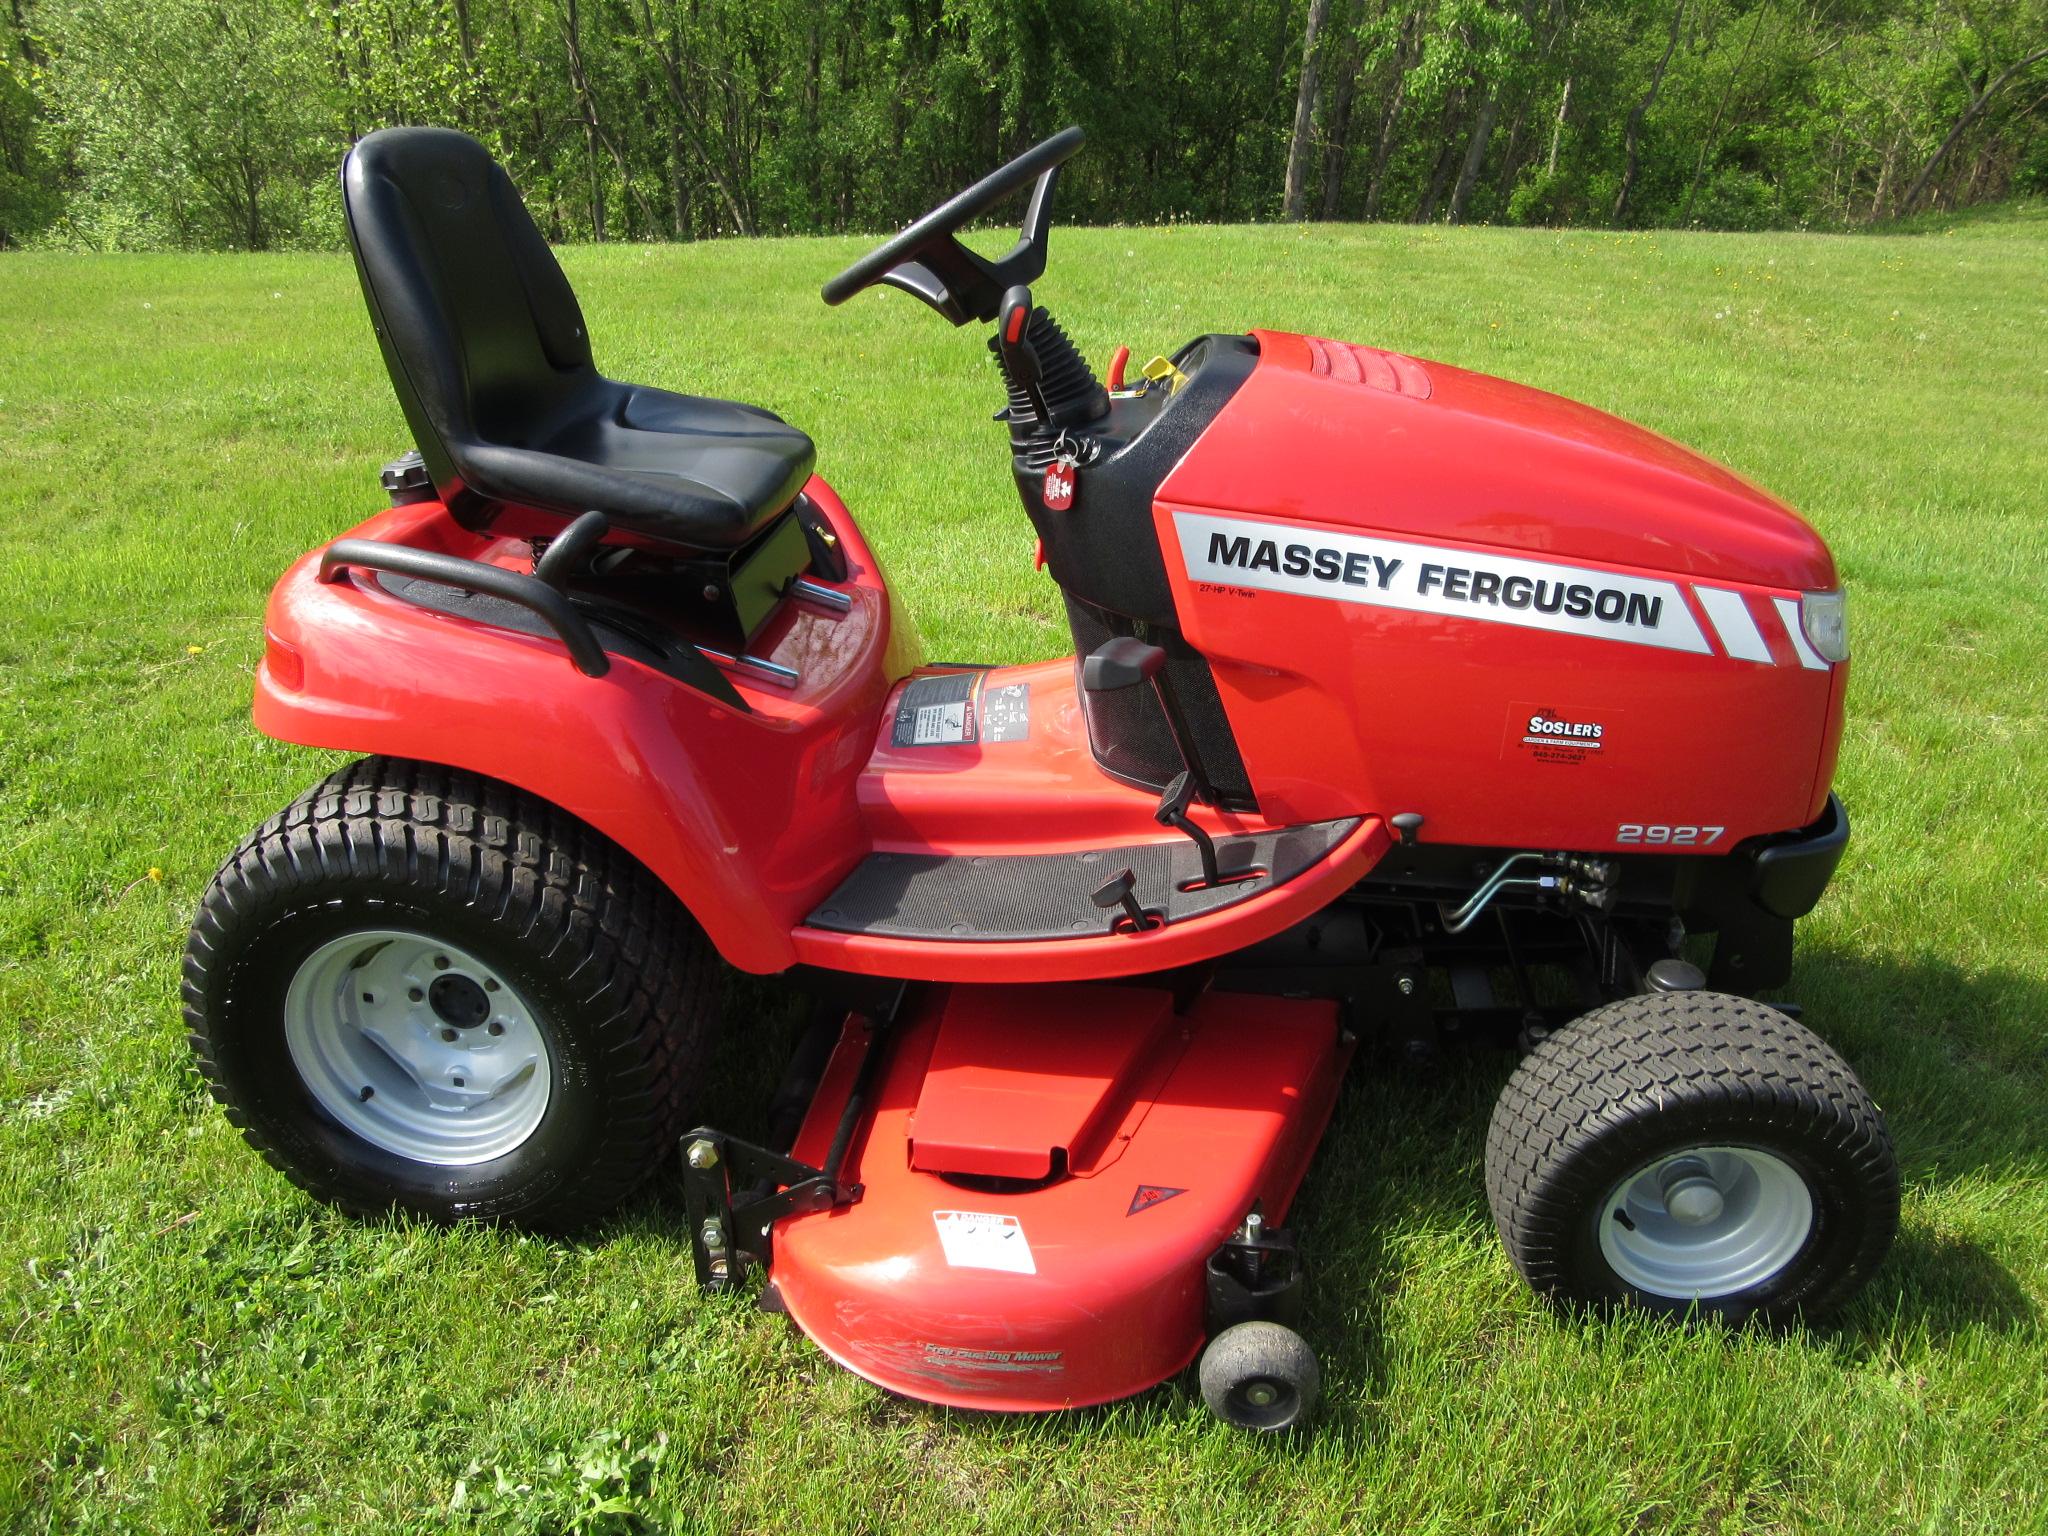 2010 Massey Ferguson 2927H Garden Tractor